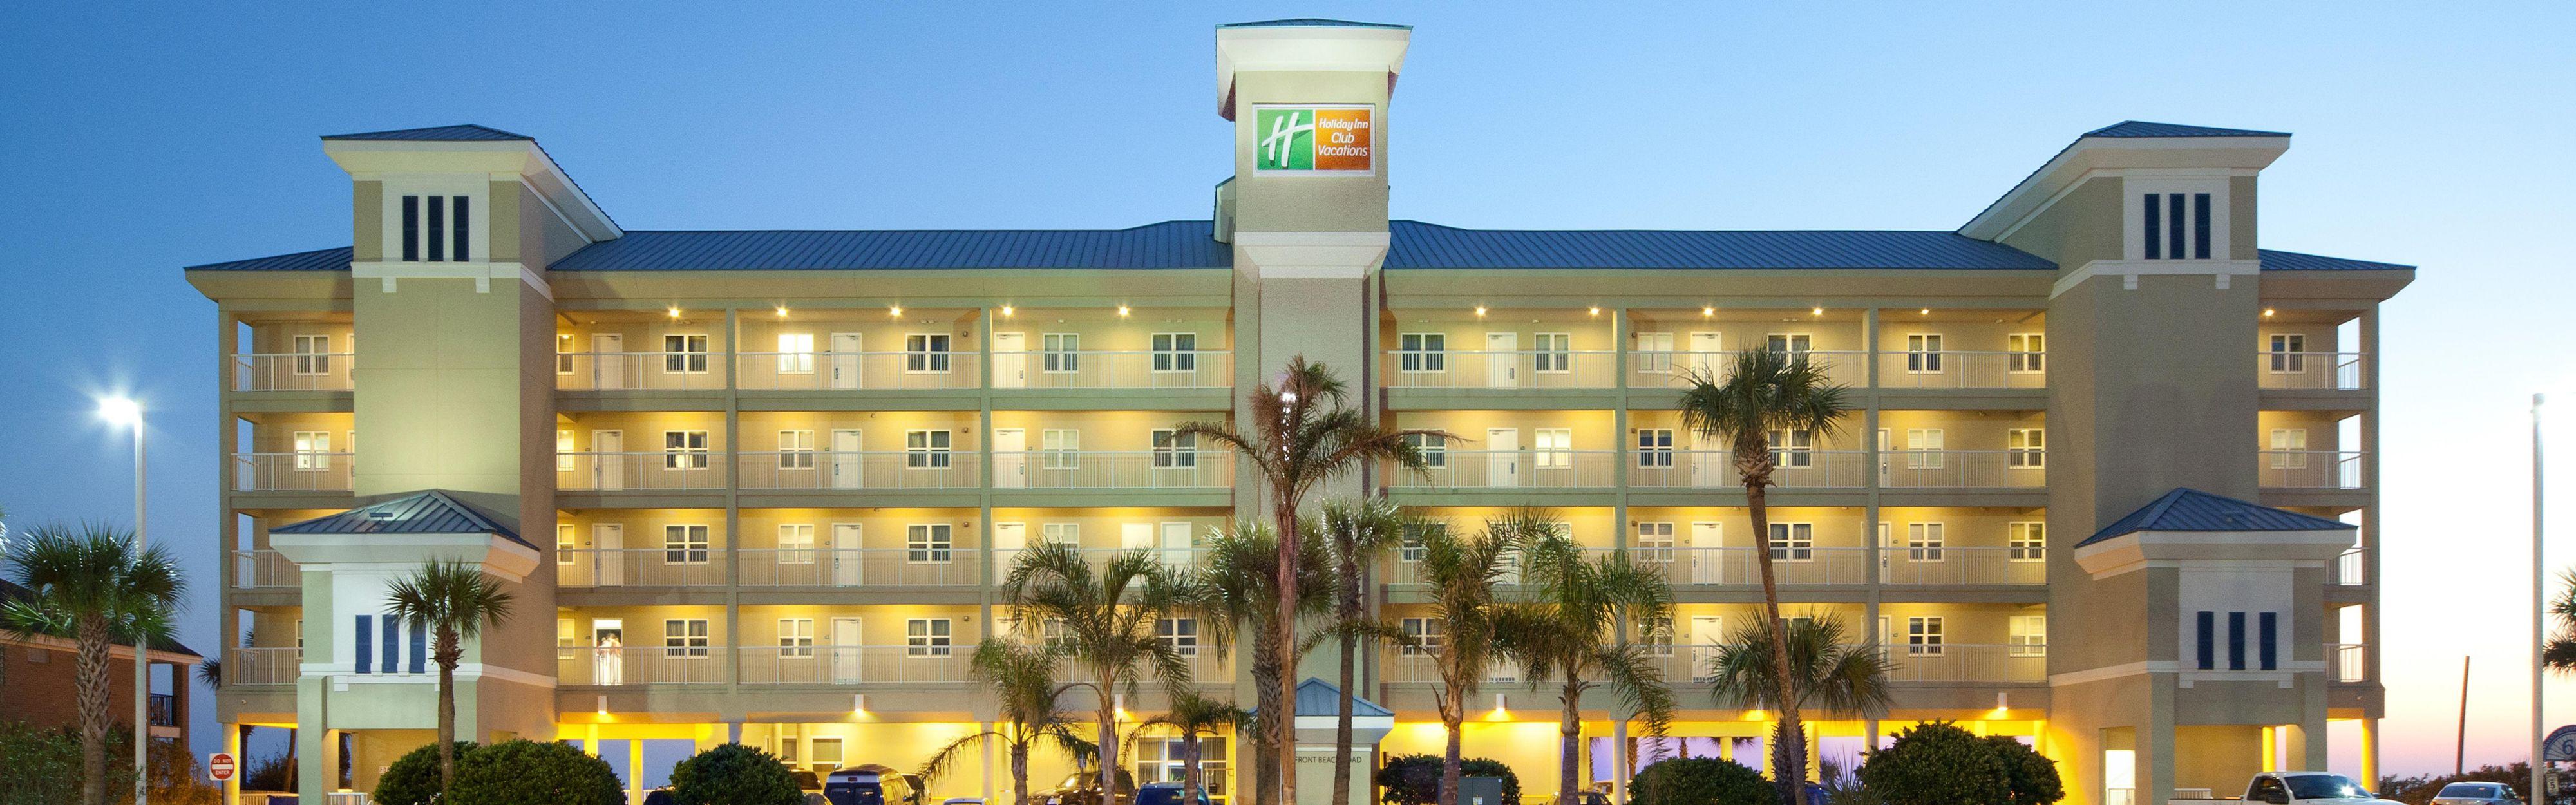 Holiday Inn Club Vacations Panama City Beach Resort image 0